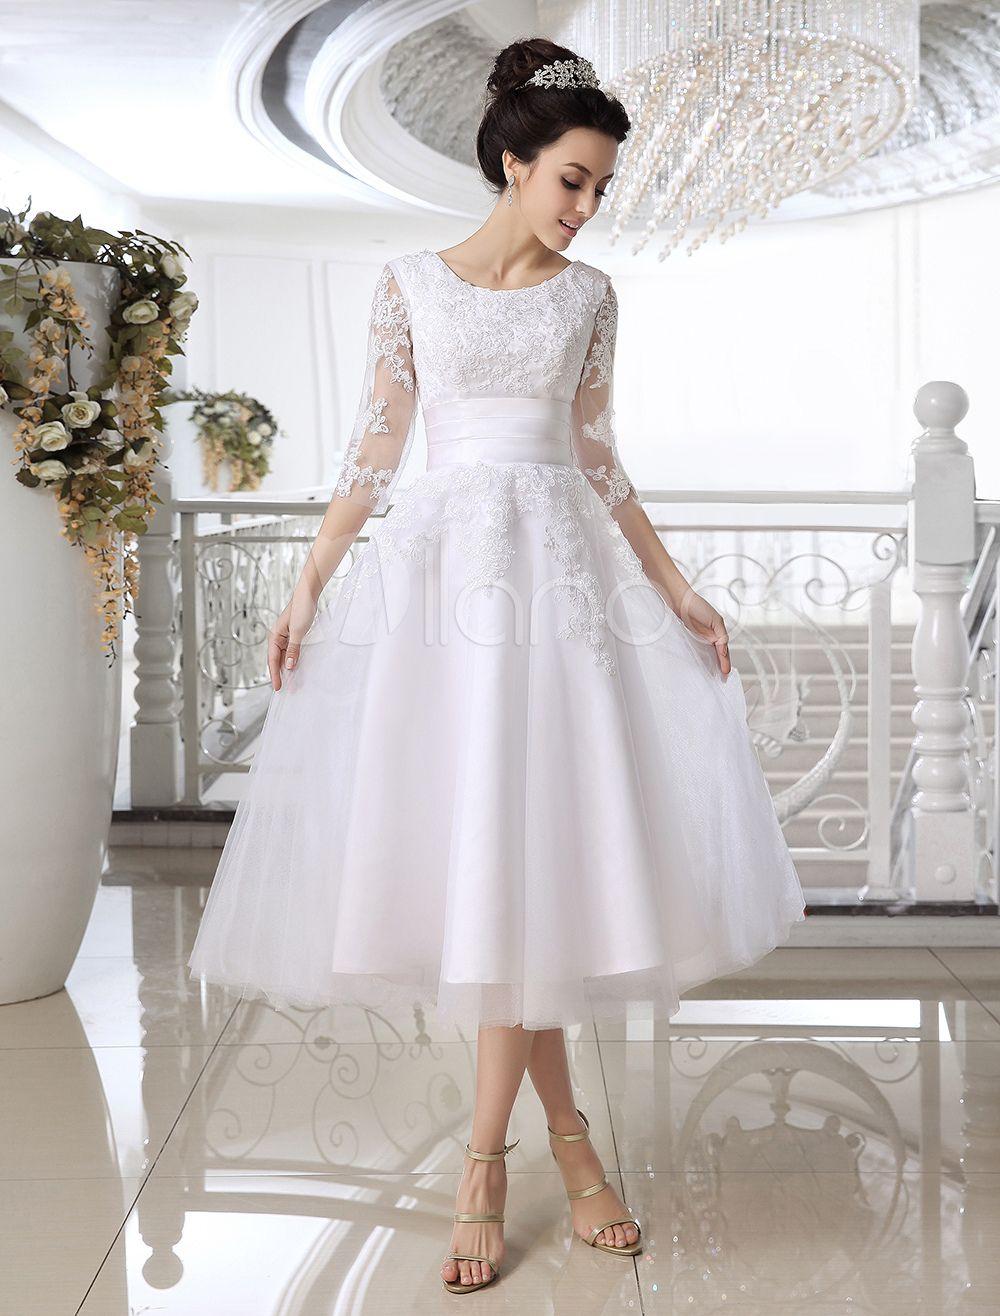 White wedding dresses  short lace Applique illusion half sleeve